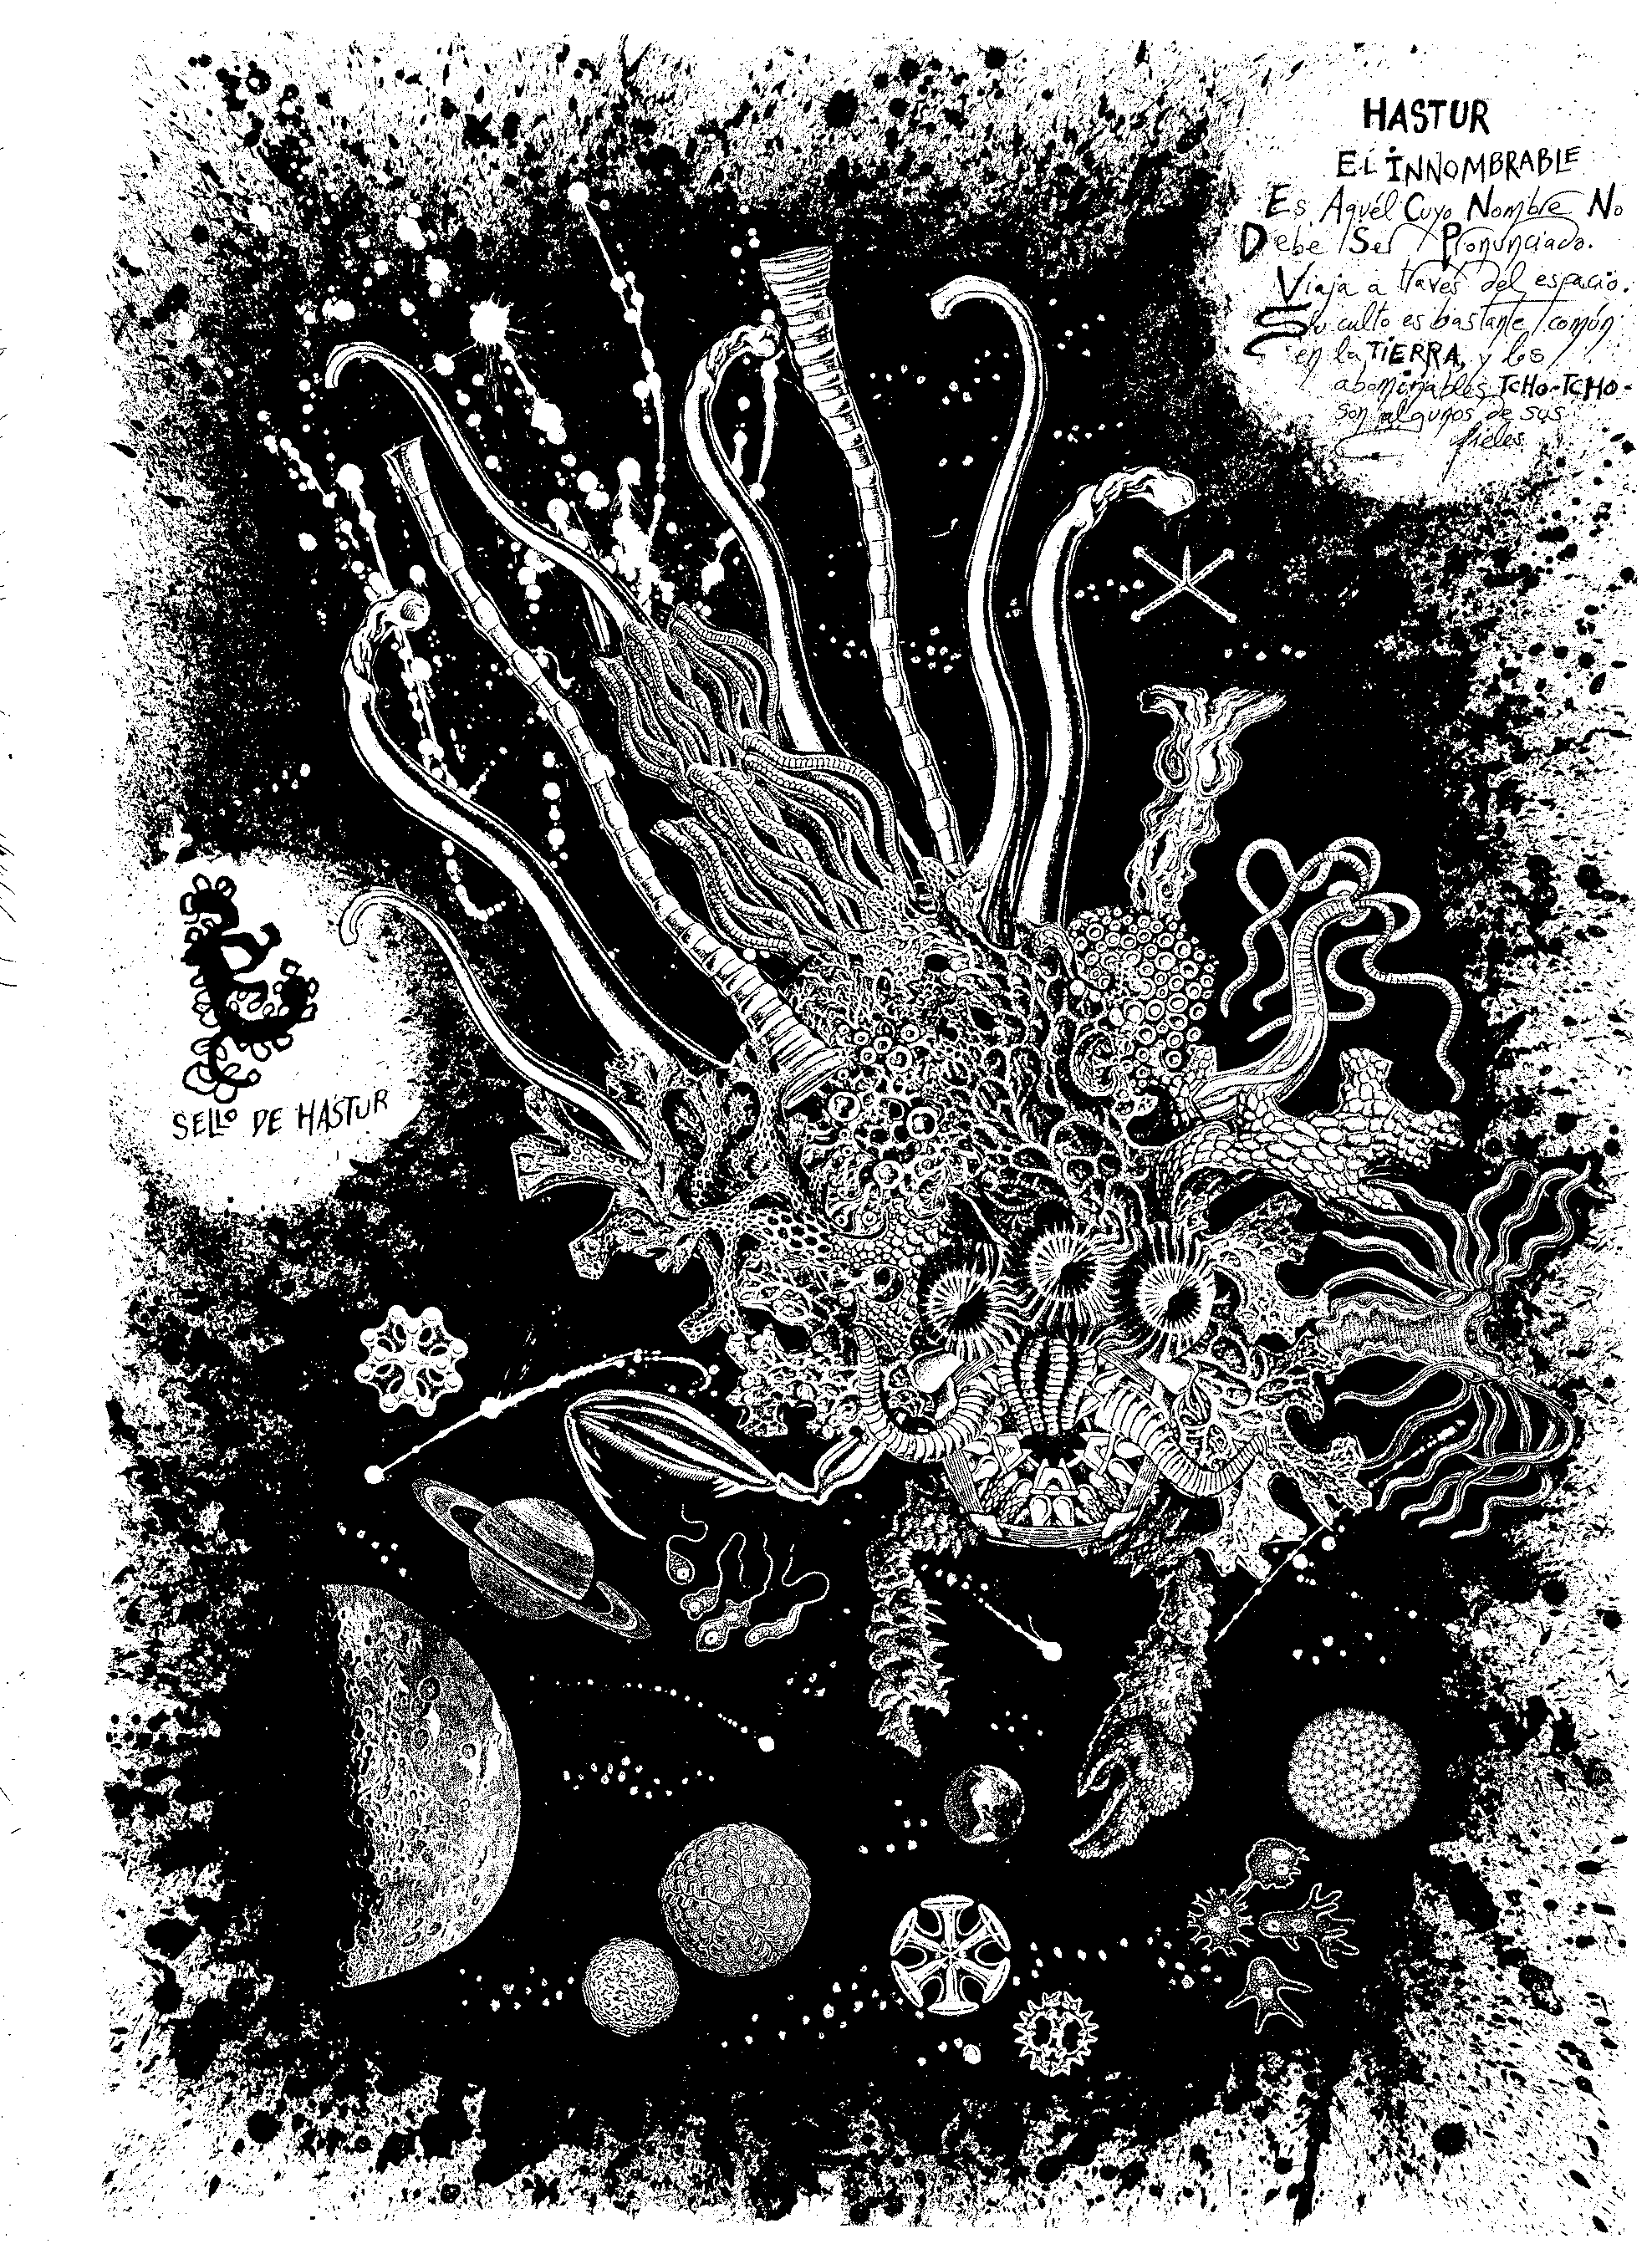 O necronomicon baixar pdf